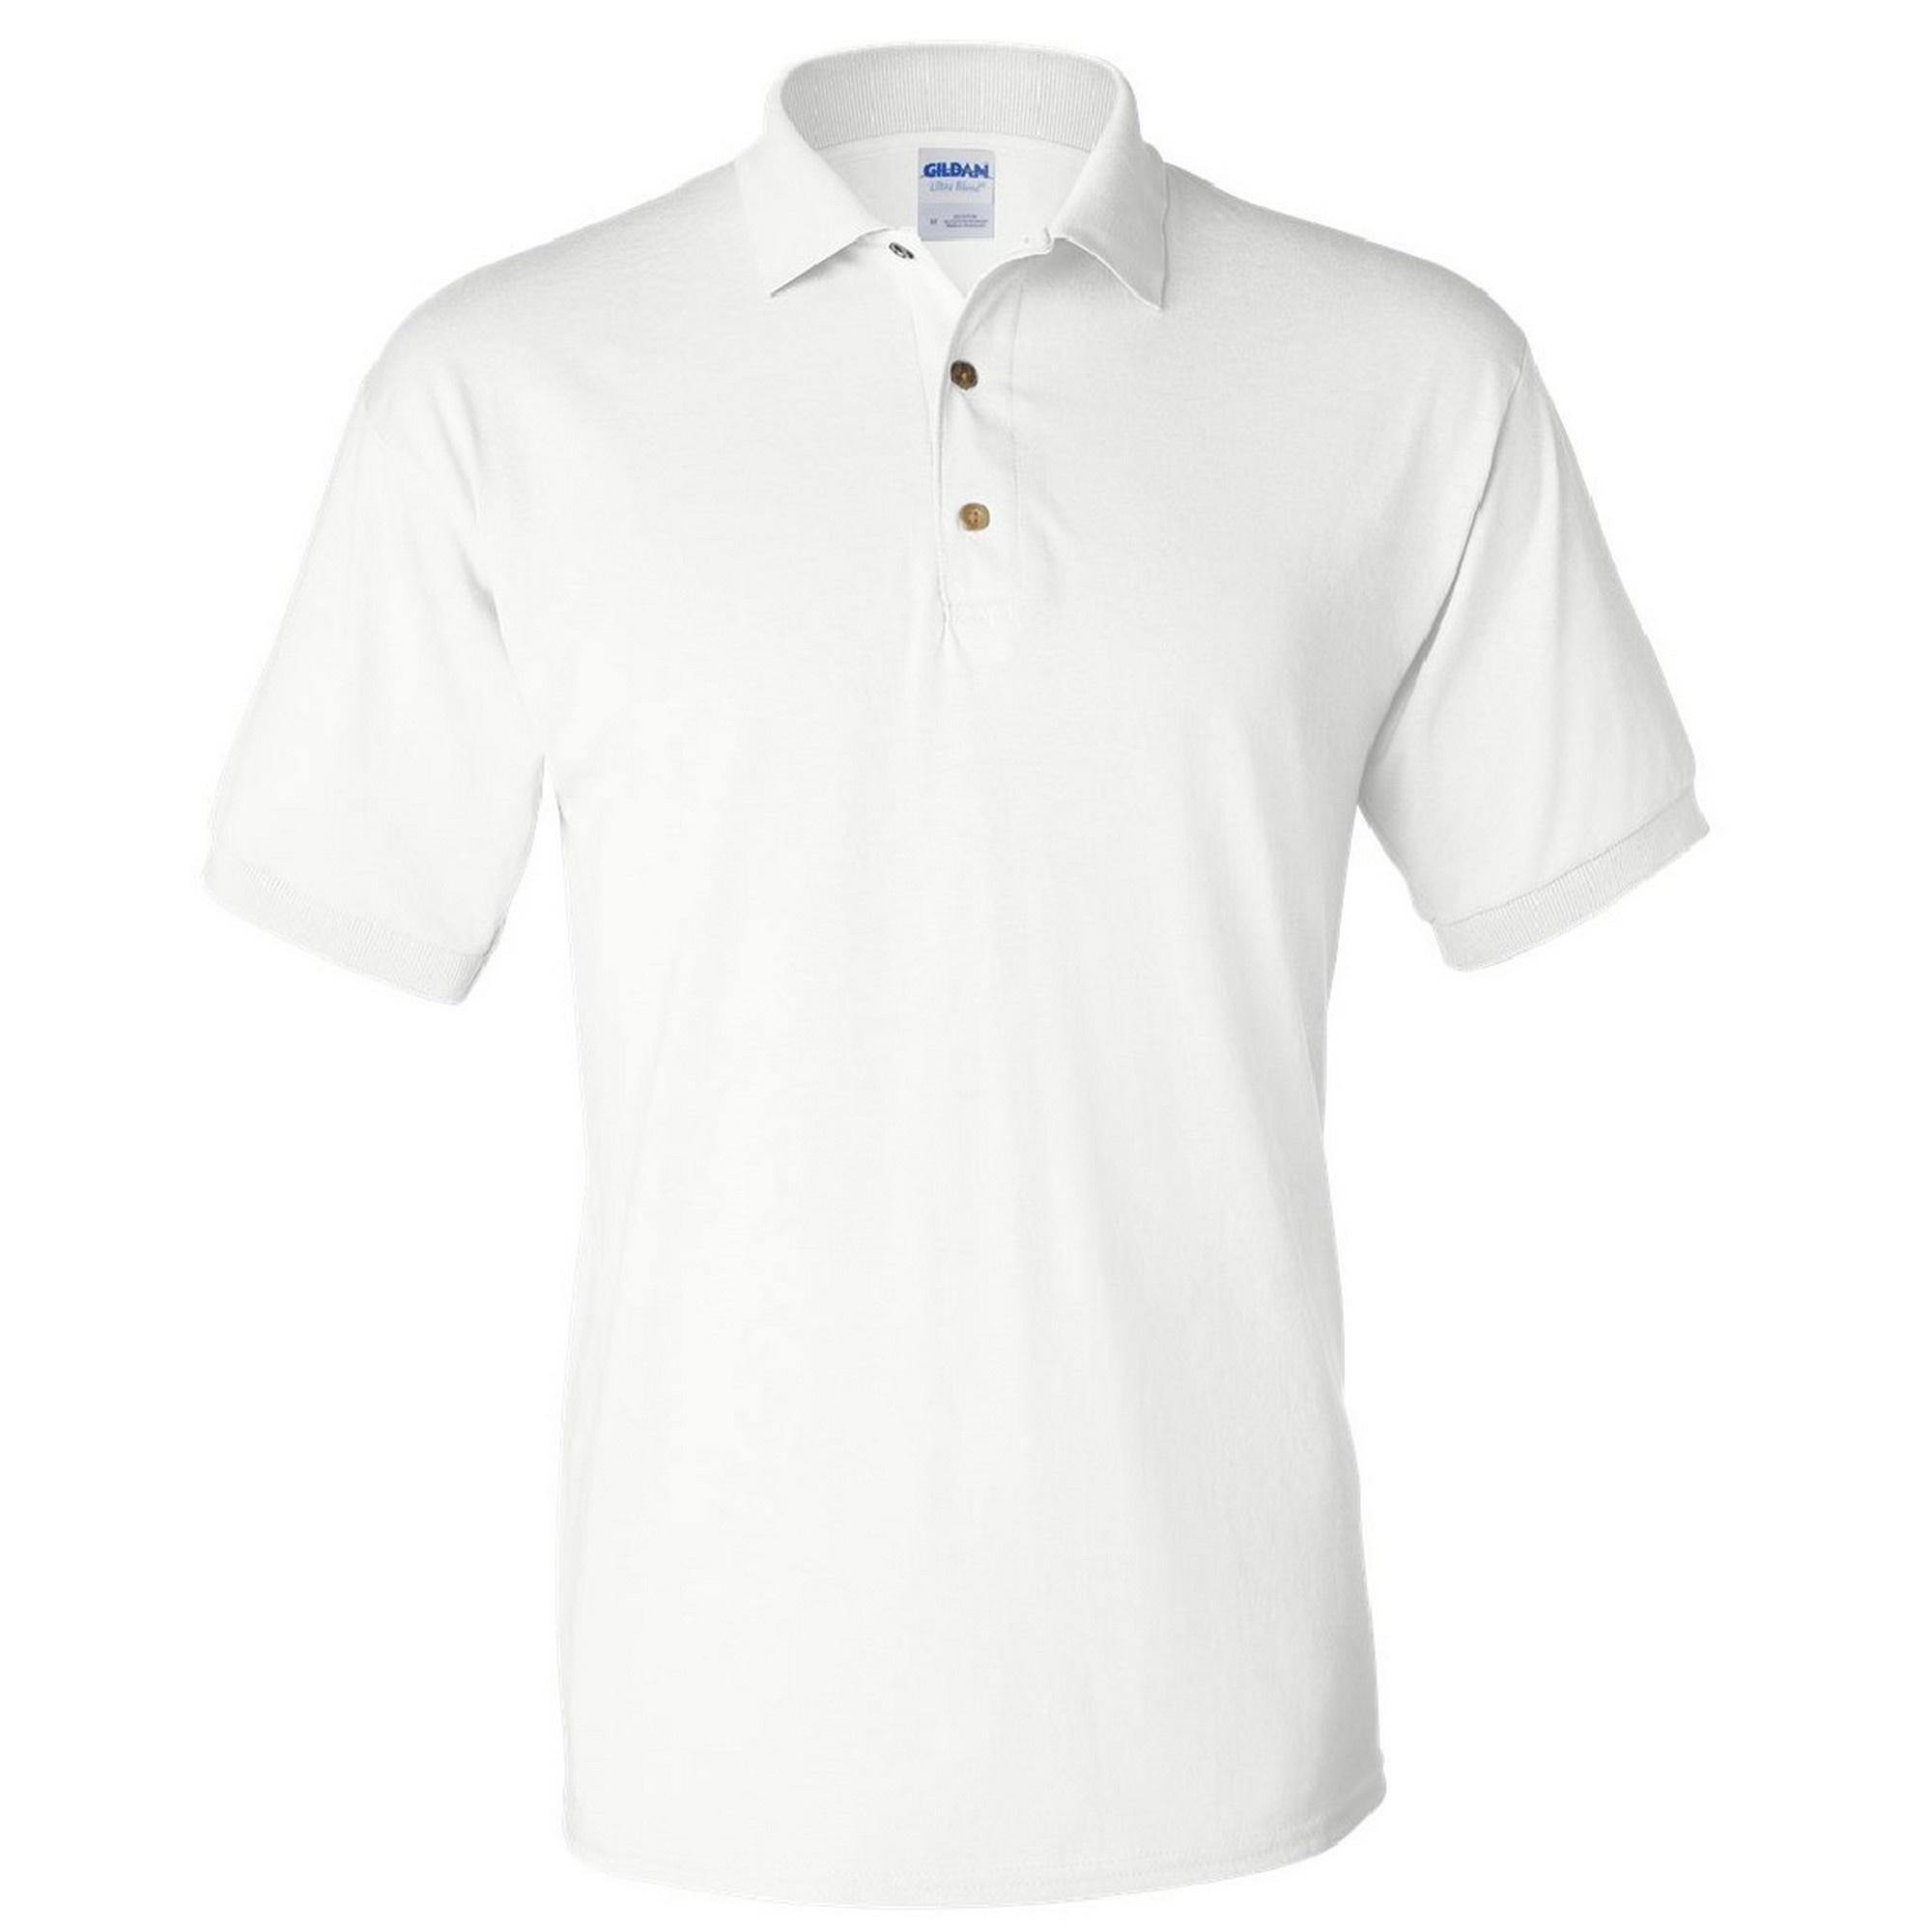 Gildan-Polo-Jersey-manga-corta-transpirable-Modelo-DryBlend-Hombre-Caballero